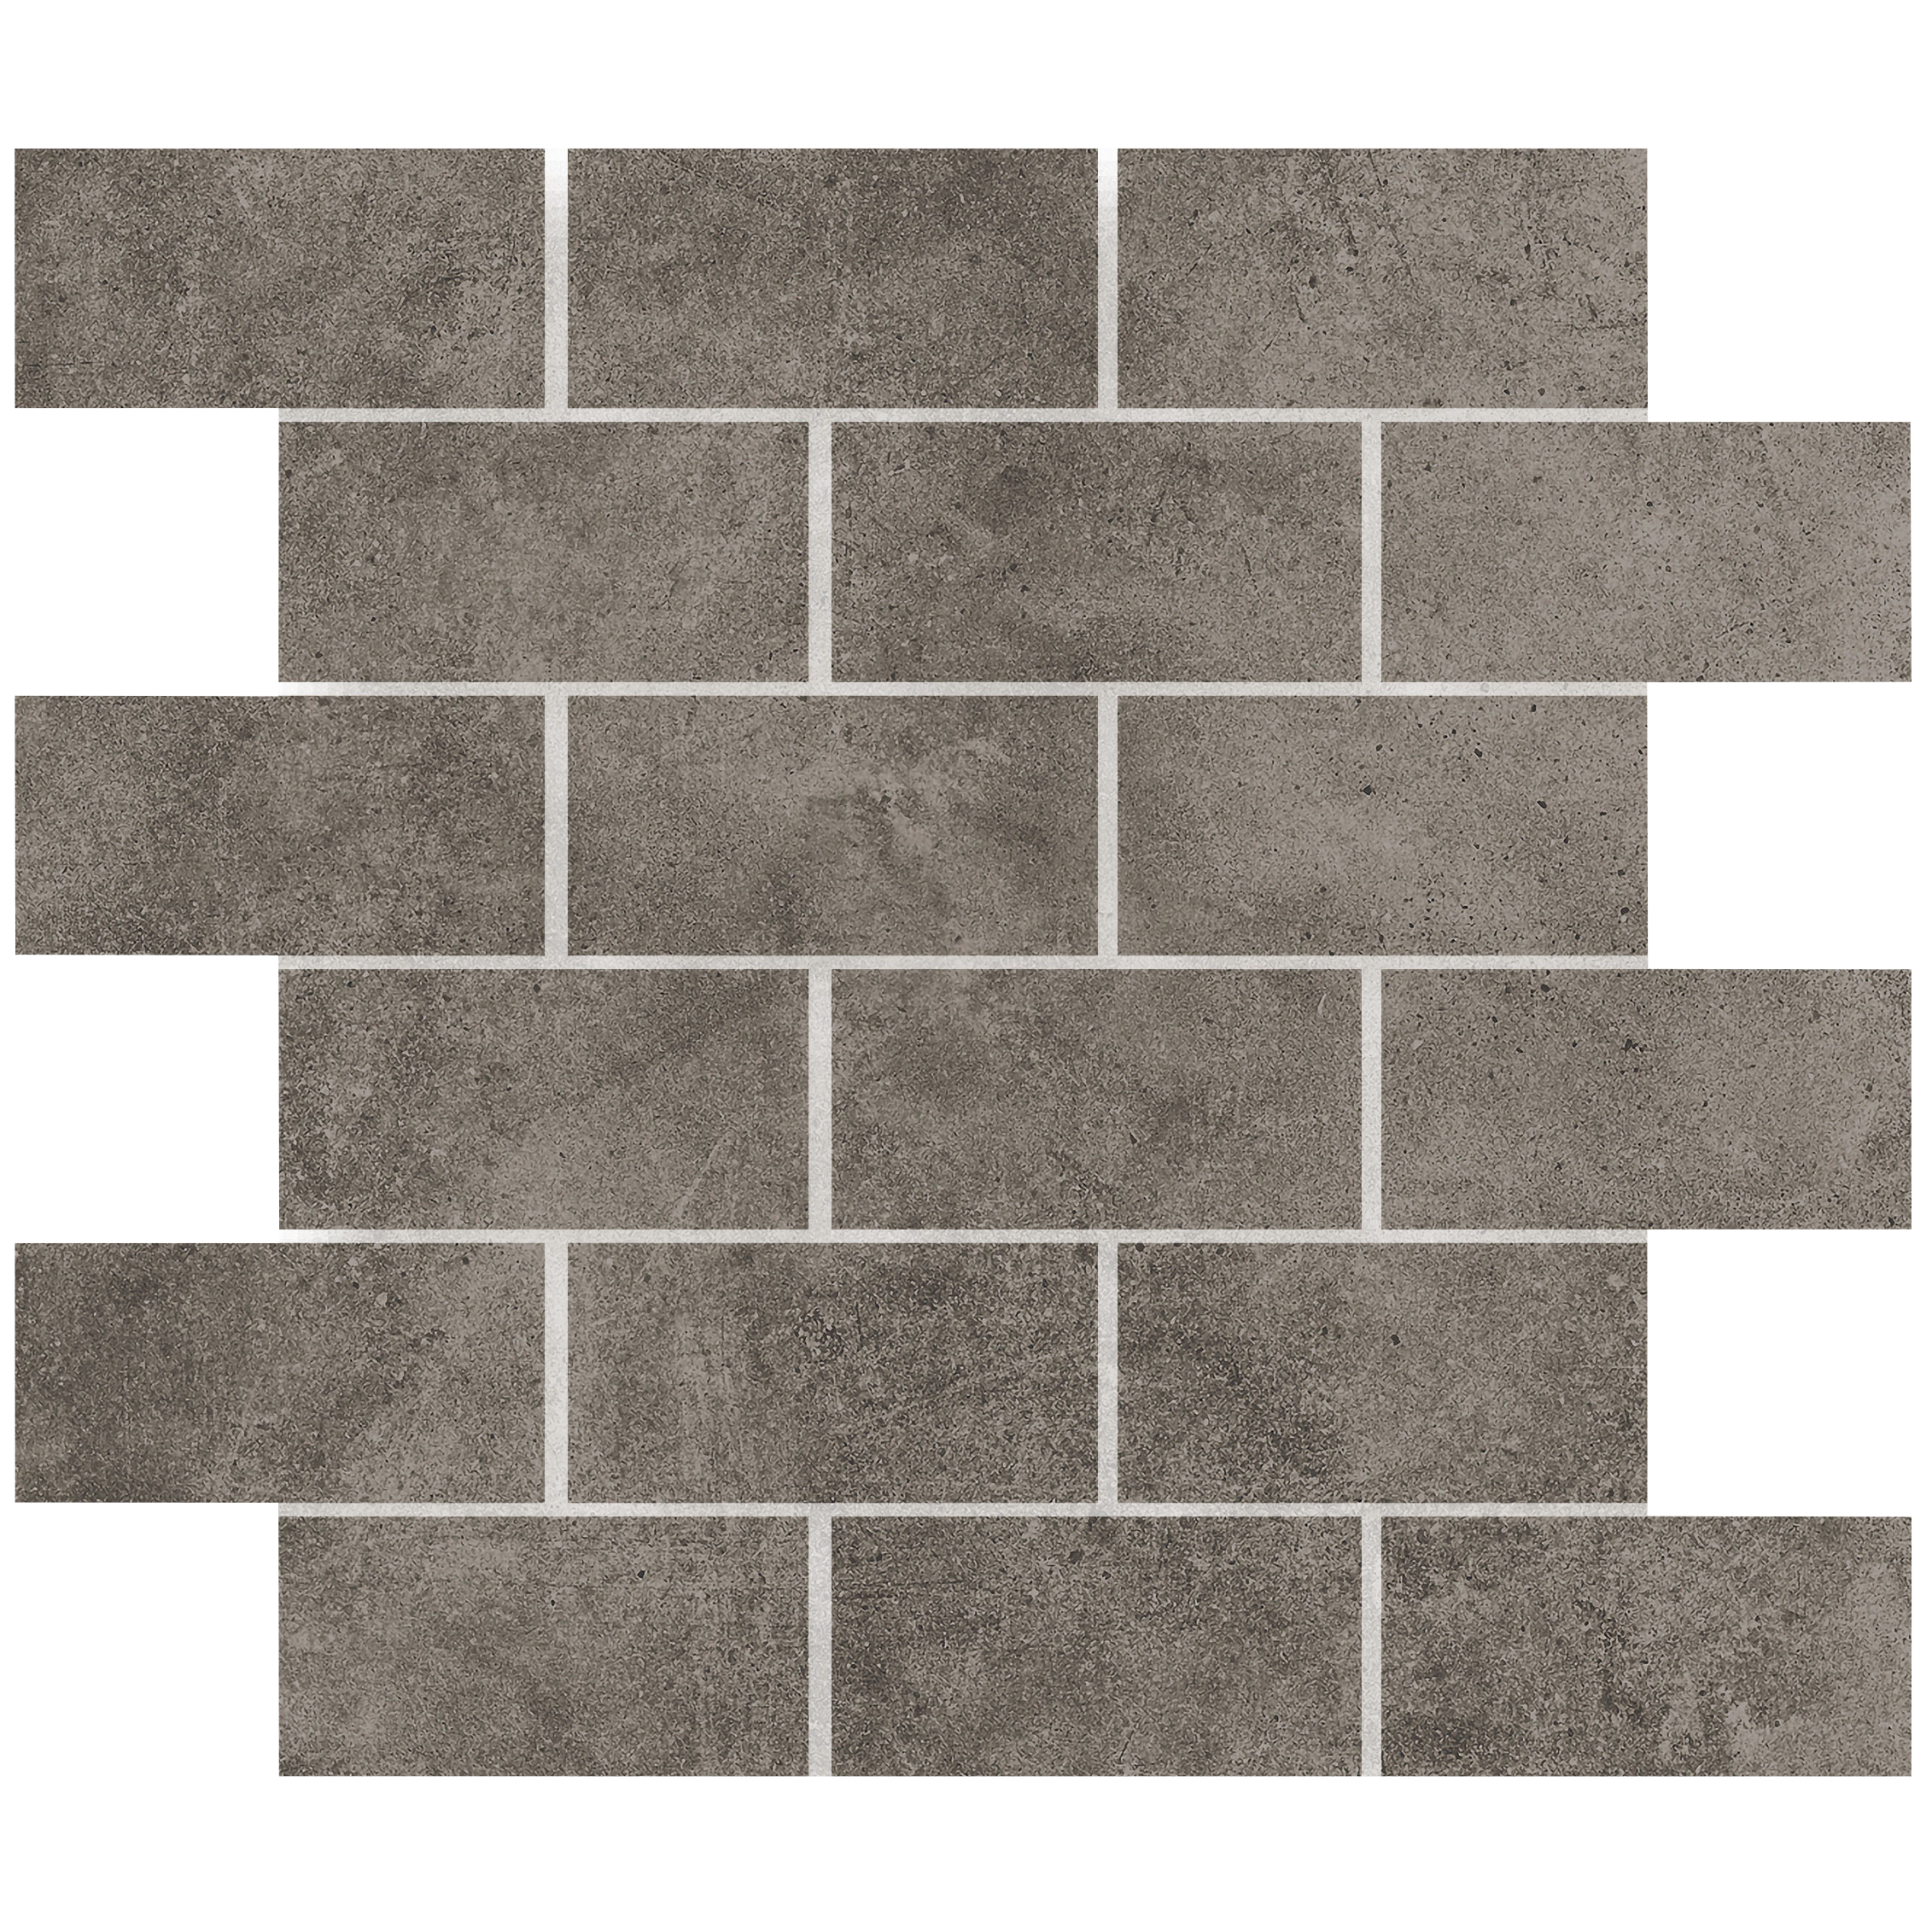 CAPETOWN peppercorn ash (grau) Typ H Image